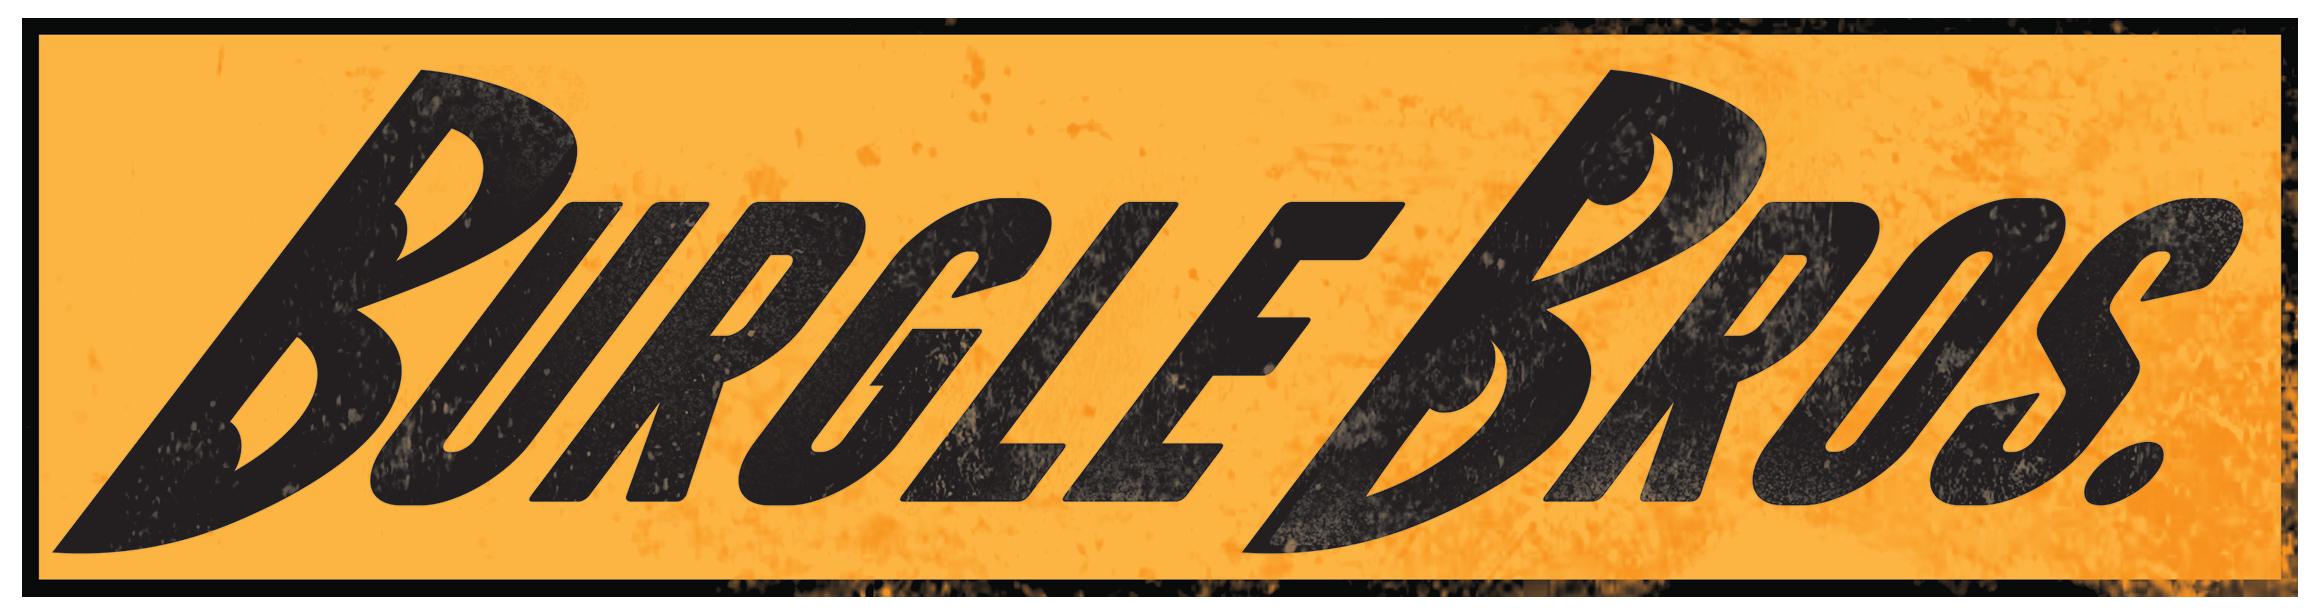 Burgle-Bros - Tim Fowers.png